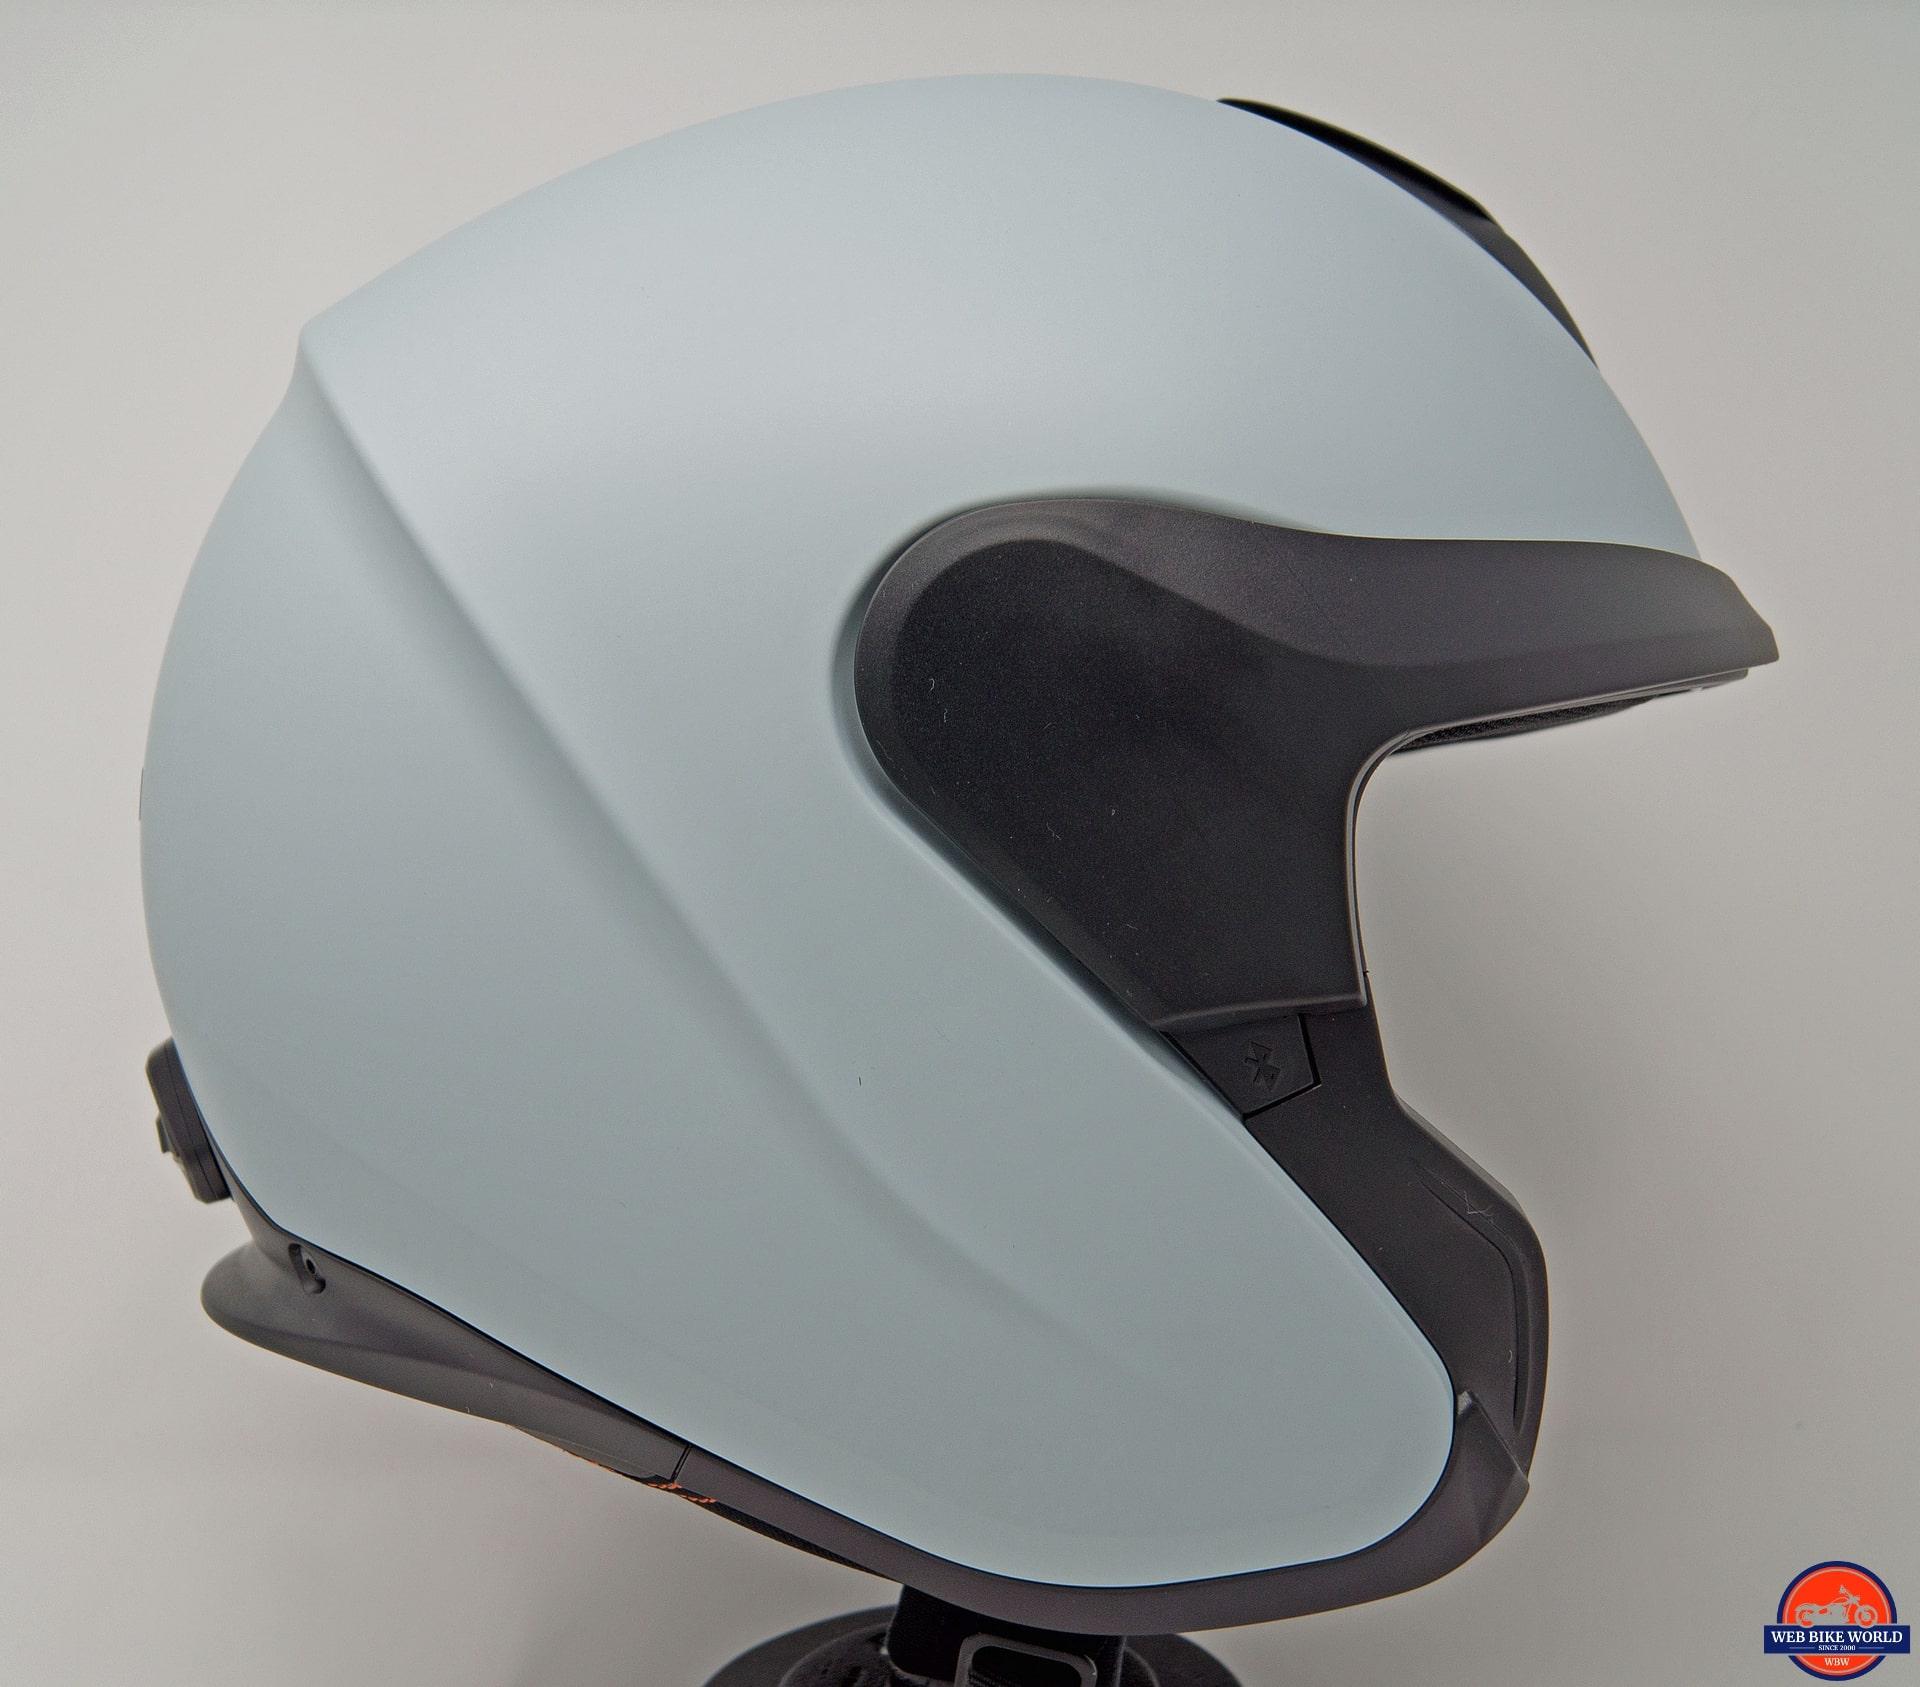 Schuberth M1 Pro profile